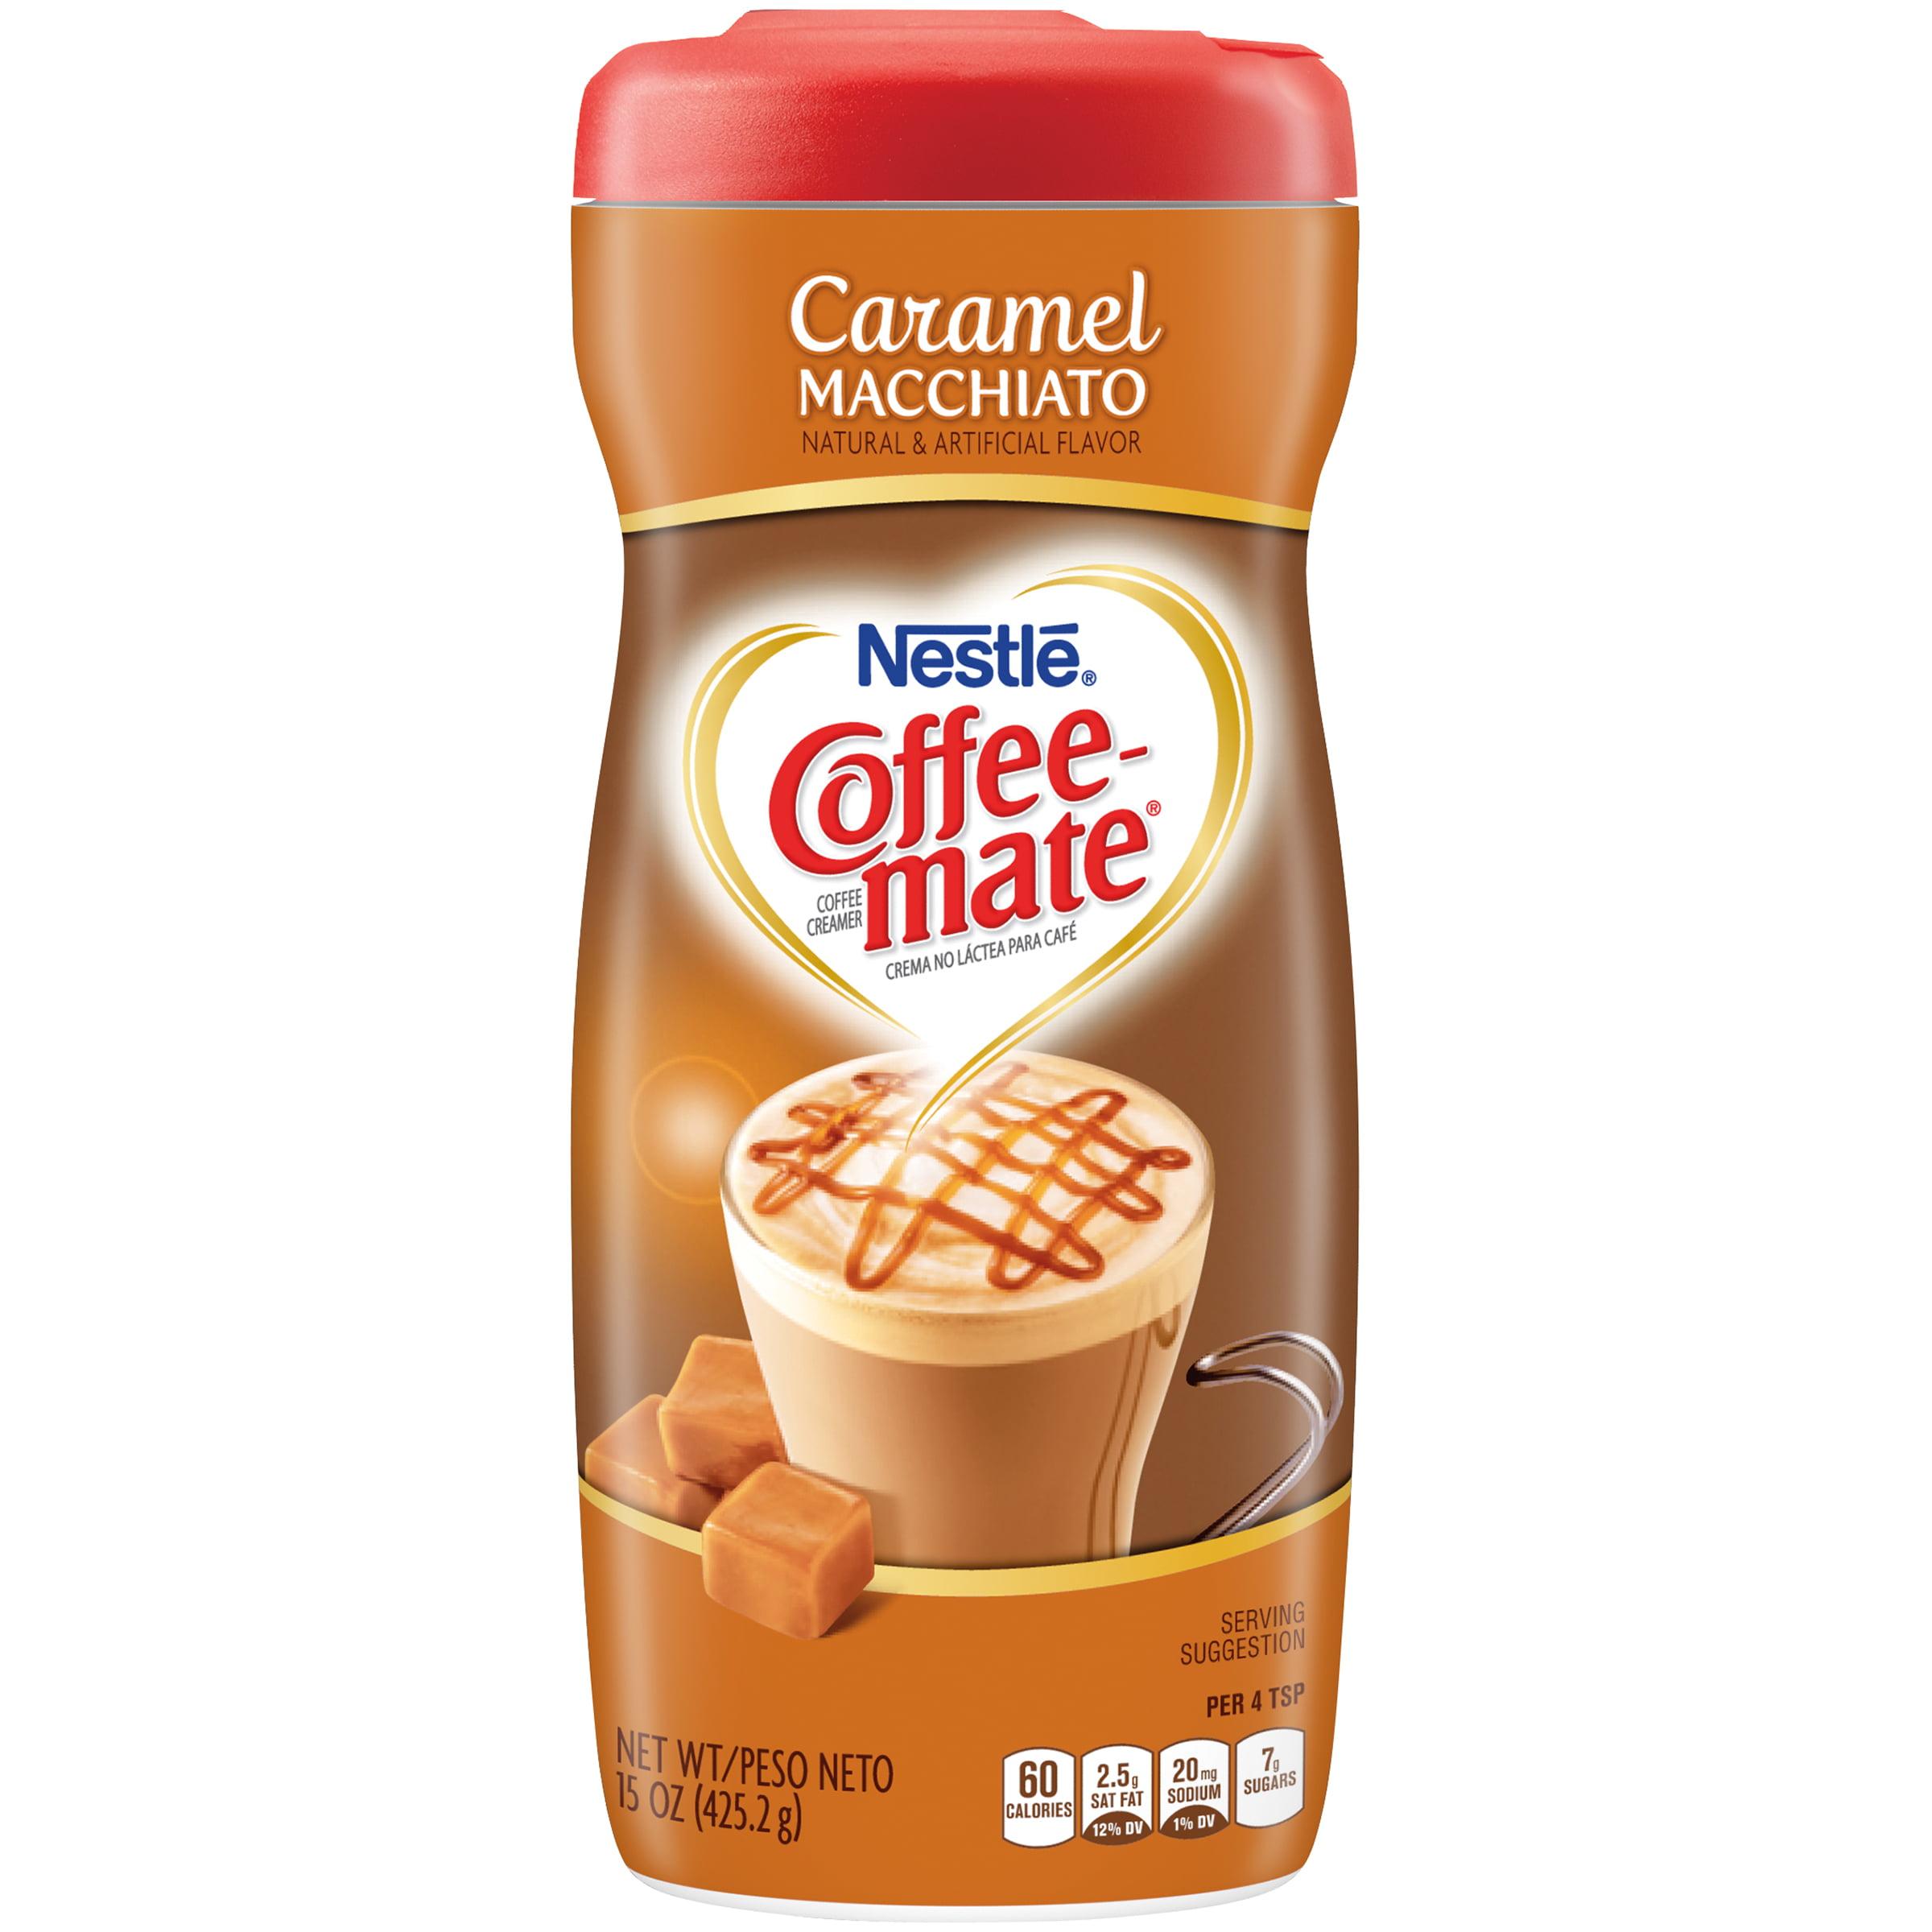 COFFEE-MATE Caramel Macchiato Coffee Creamer 15 oz. Canister